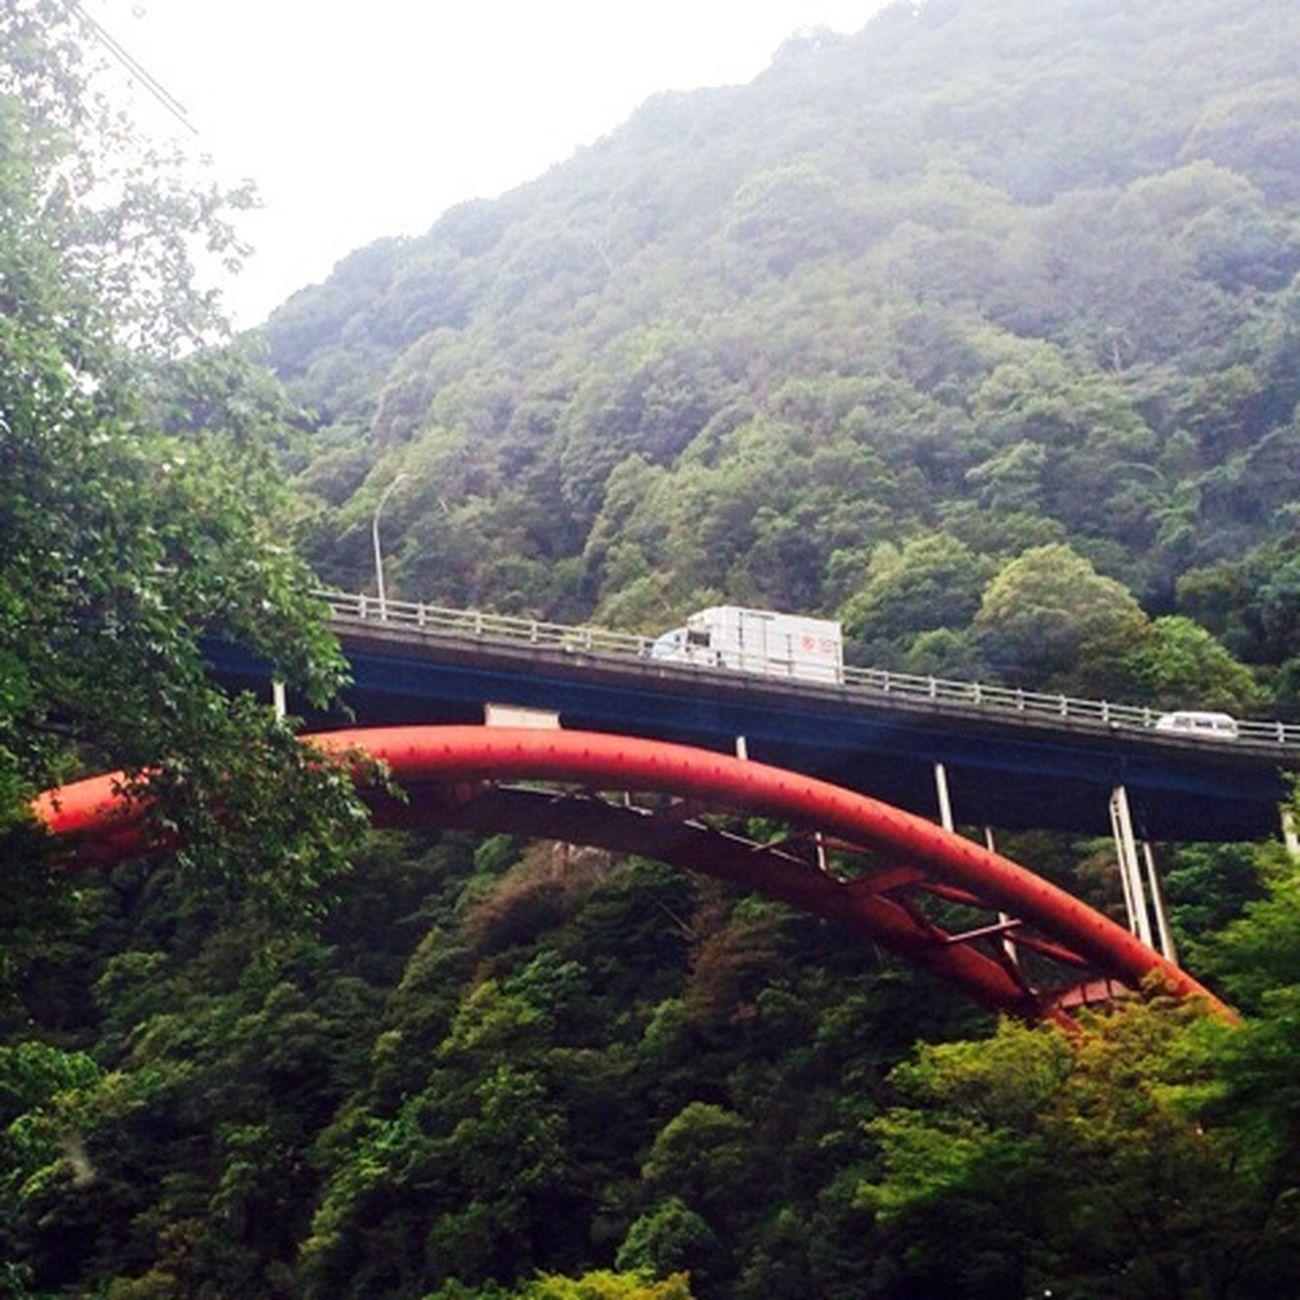 Japan Hyogo Kobe Green IPhone Car Feelsogood Mountain View